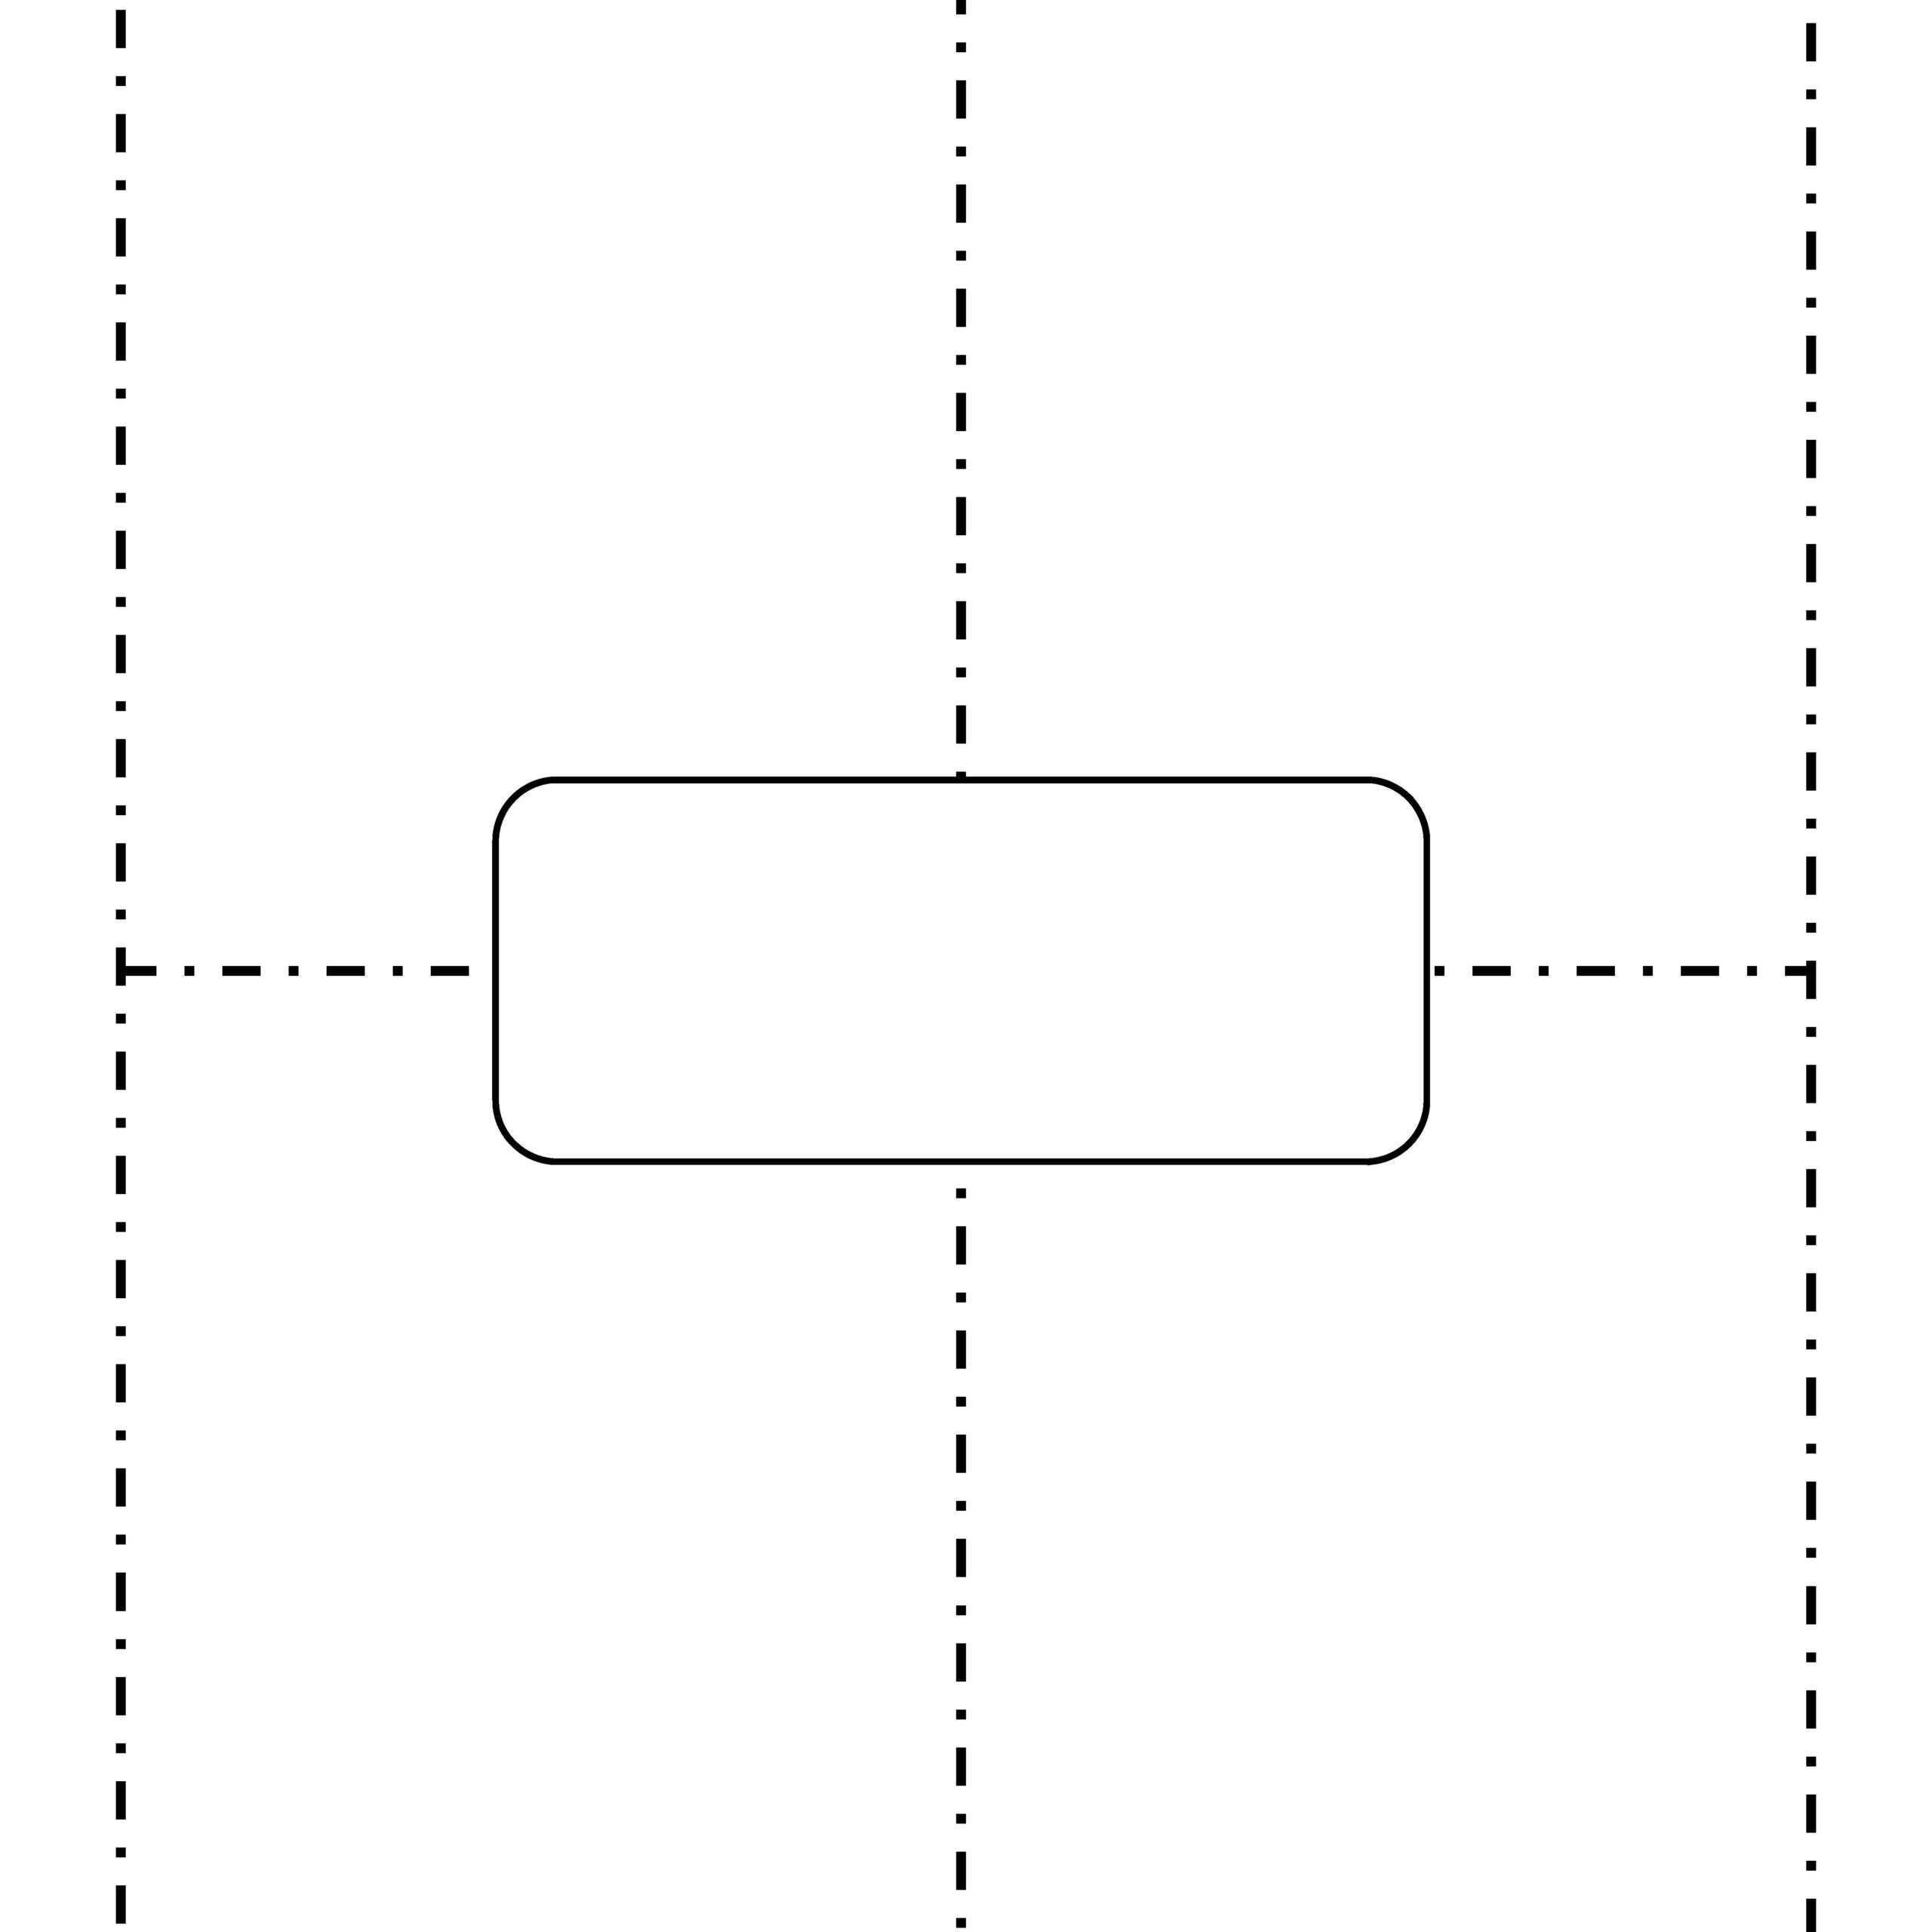 Frayer Model Worksheet | Printable Worksheets And Activities Intended For Blank Frayer Model Template